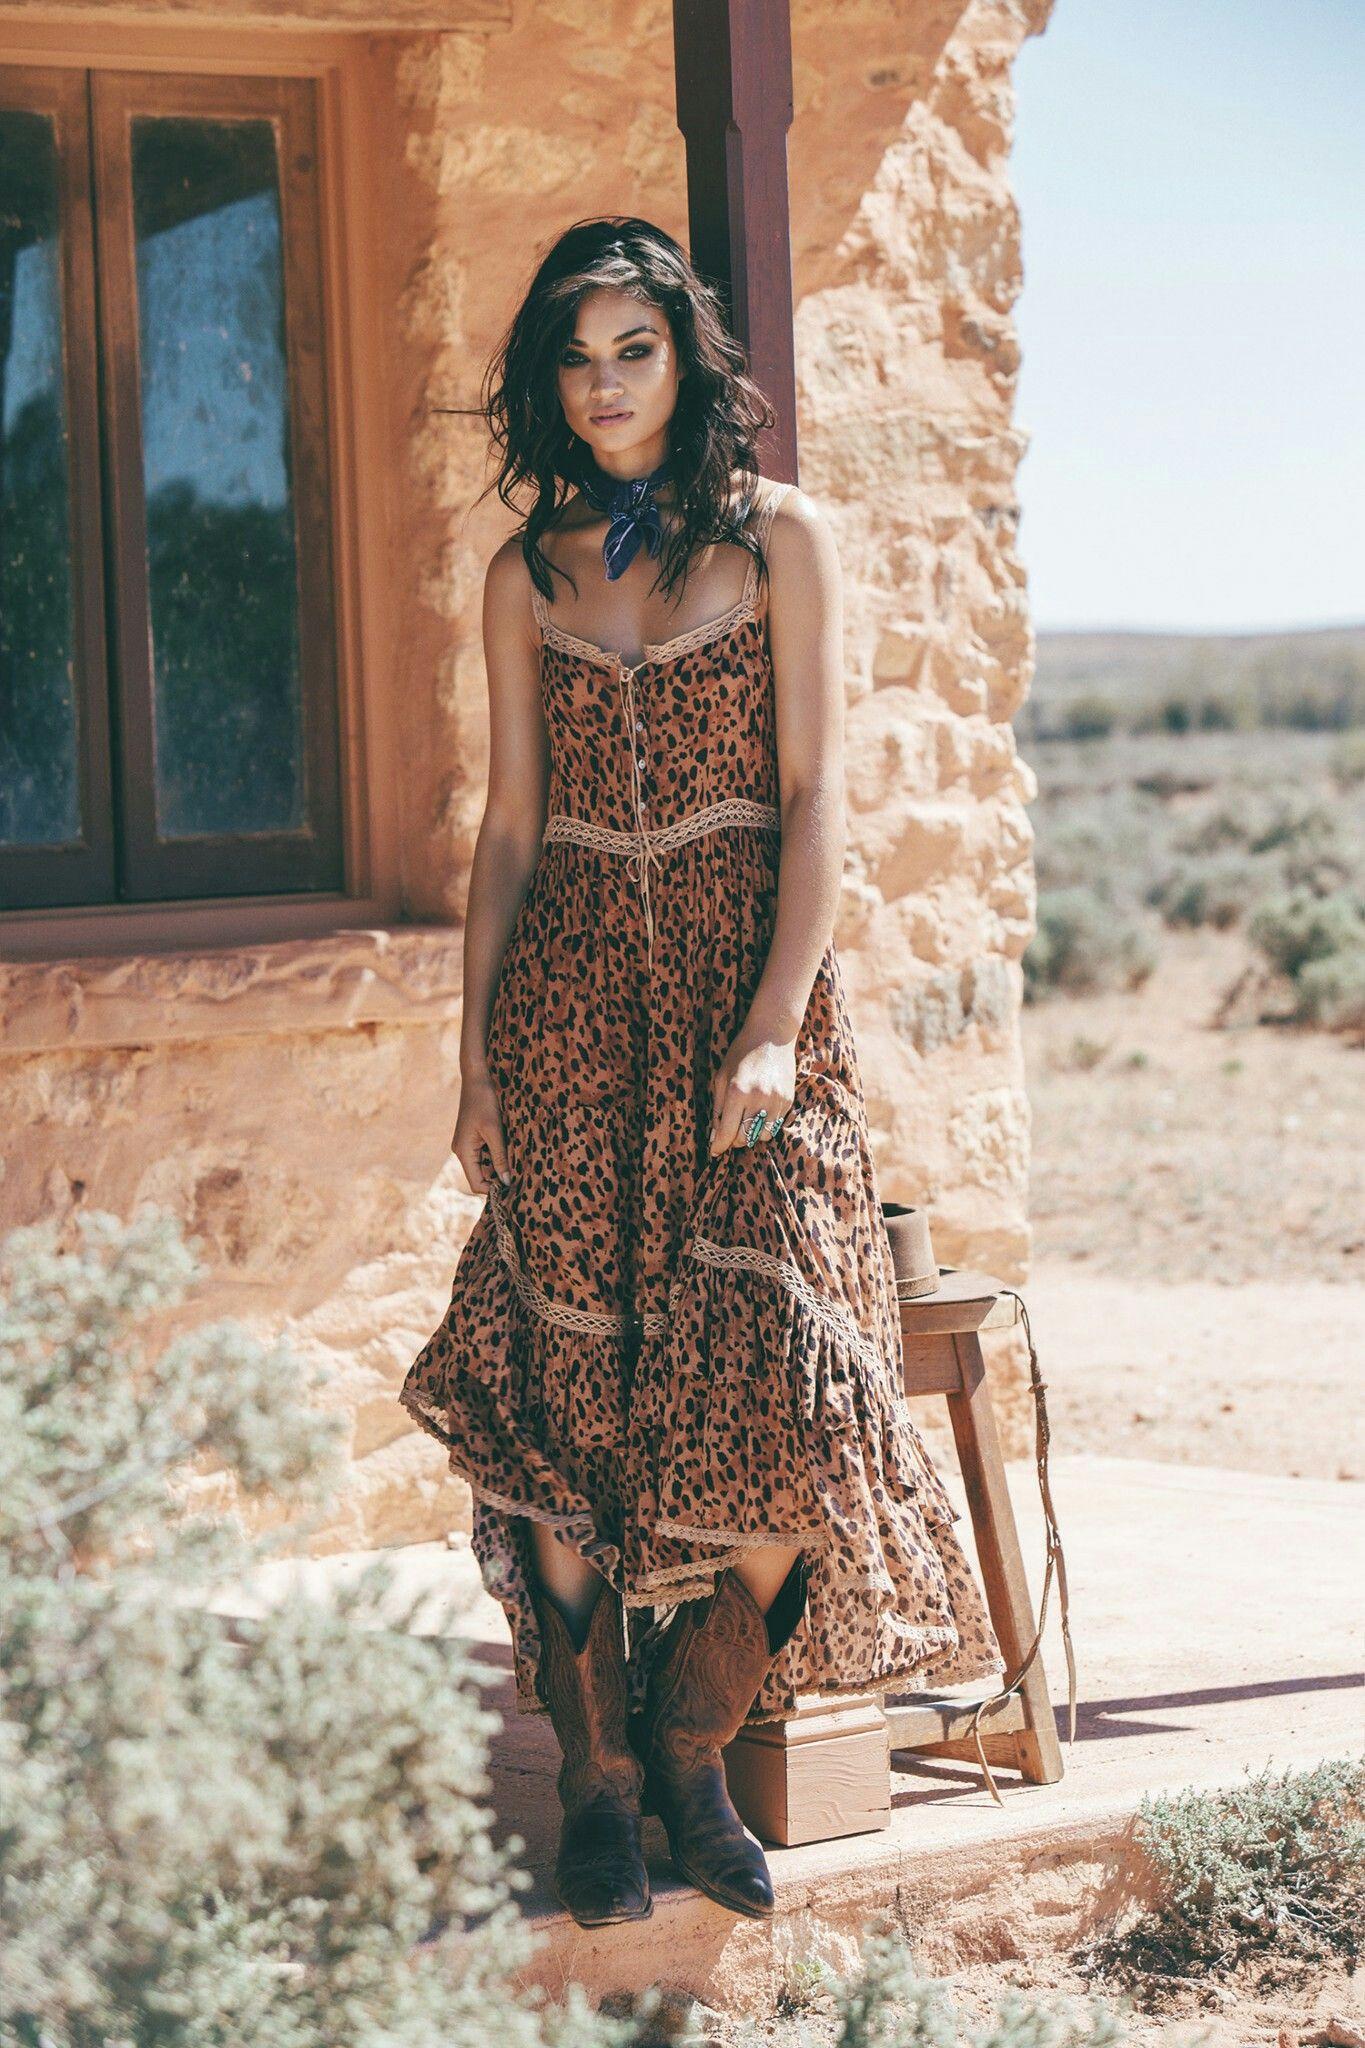 Pin by Karin Malm on Tea dresses in Pinterest Boho Gypsy